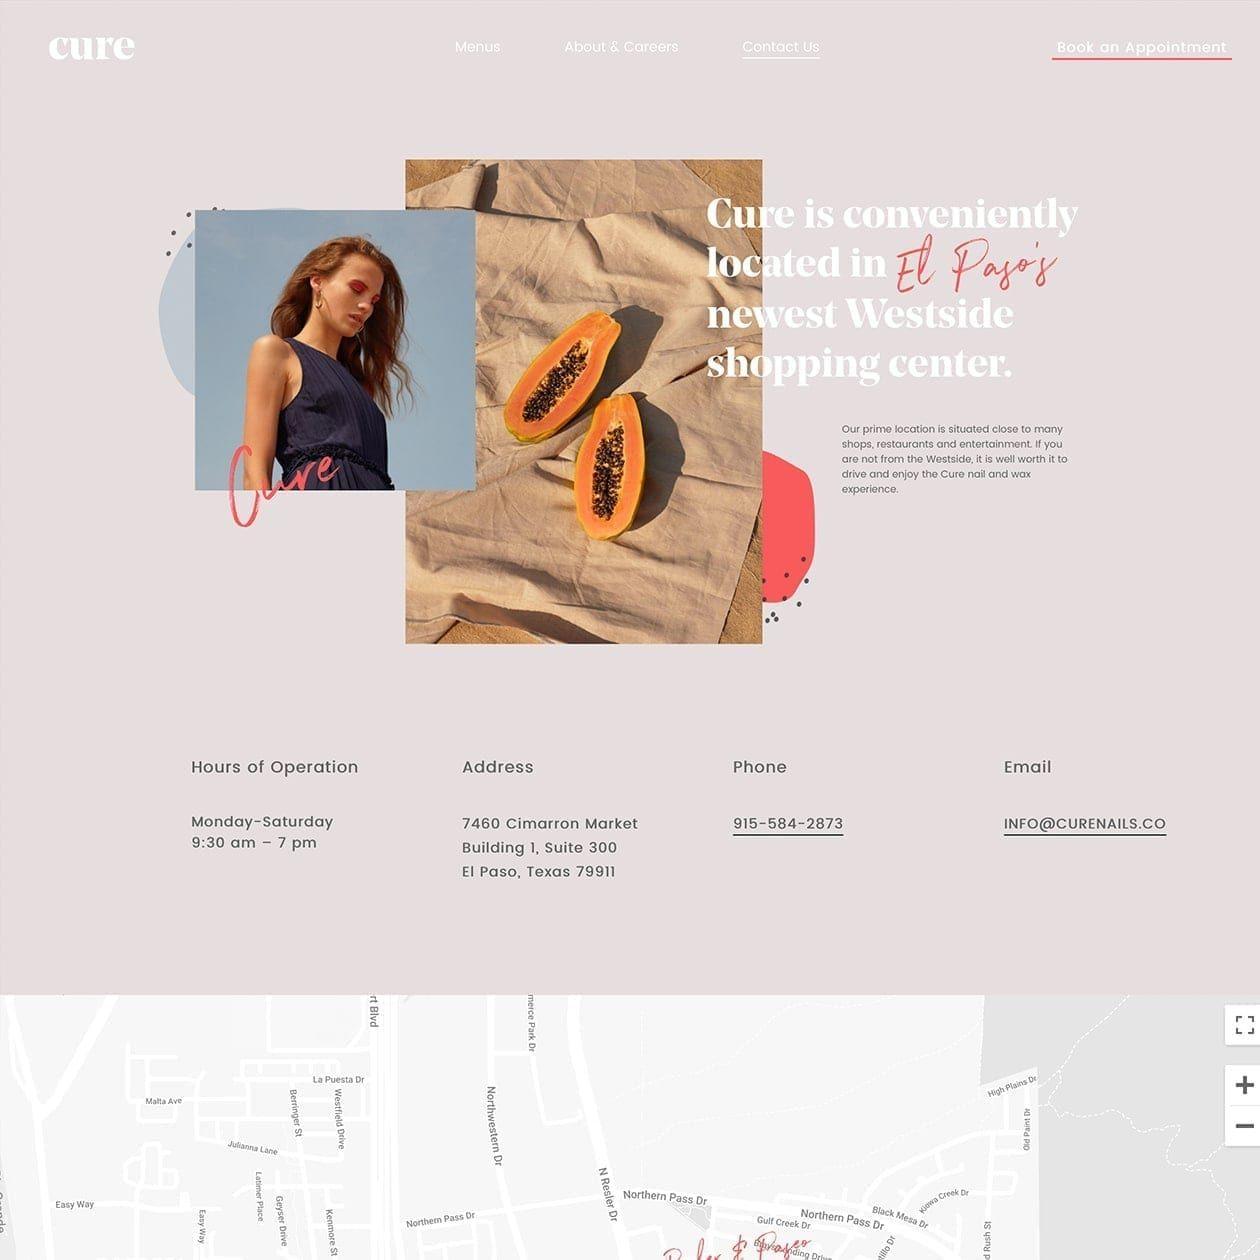 Seven Creative Web Design Tips For Non Designers The Fourth House Co In 2020 Web Design Tips Creative Web Design Website Design